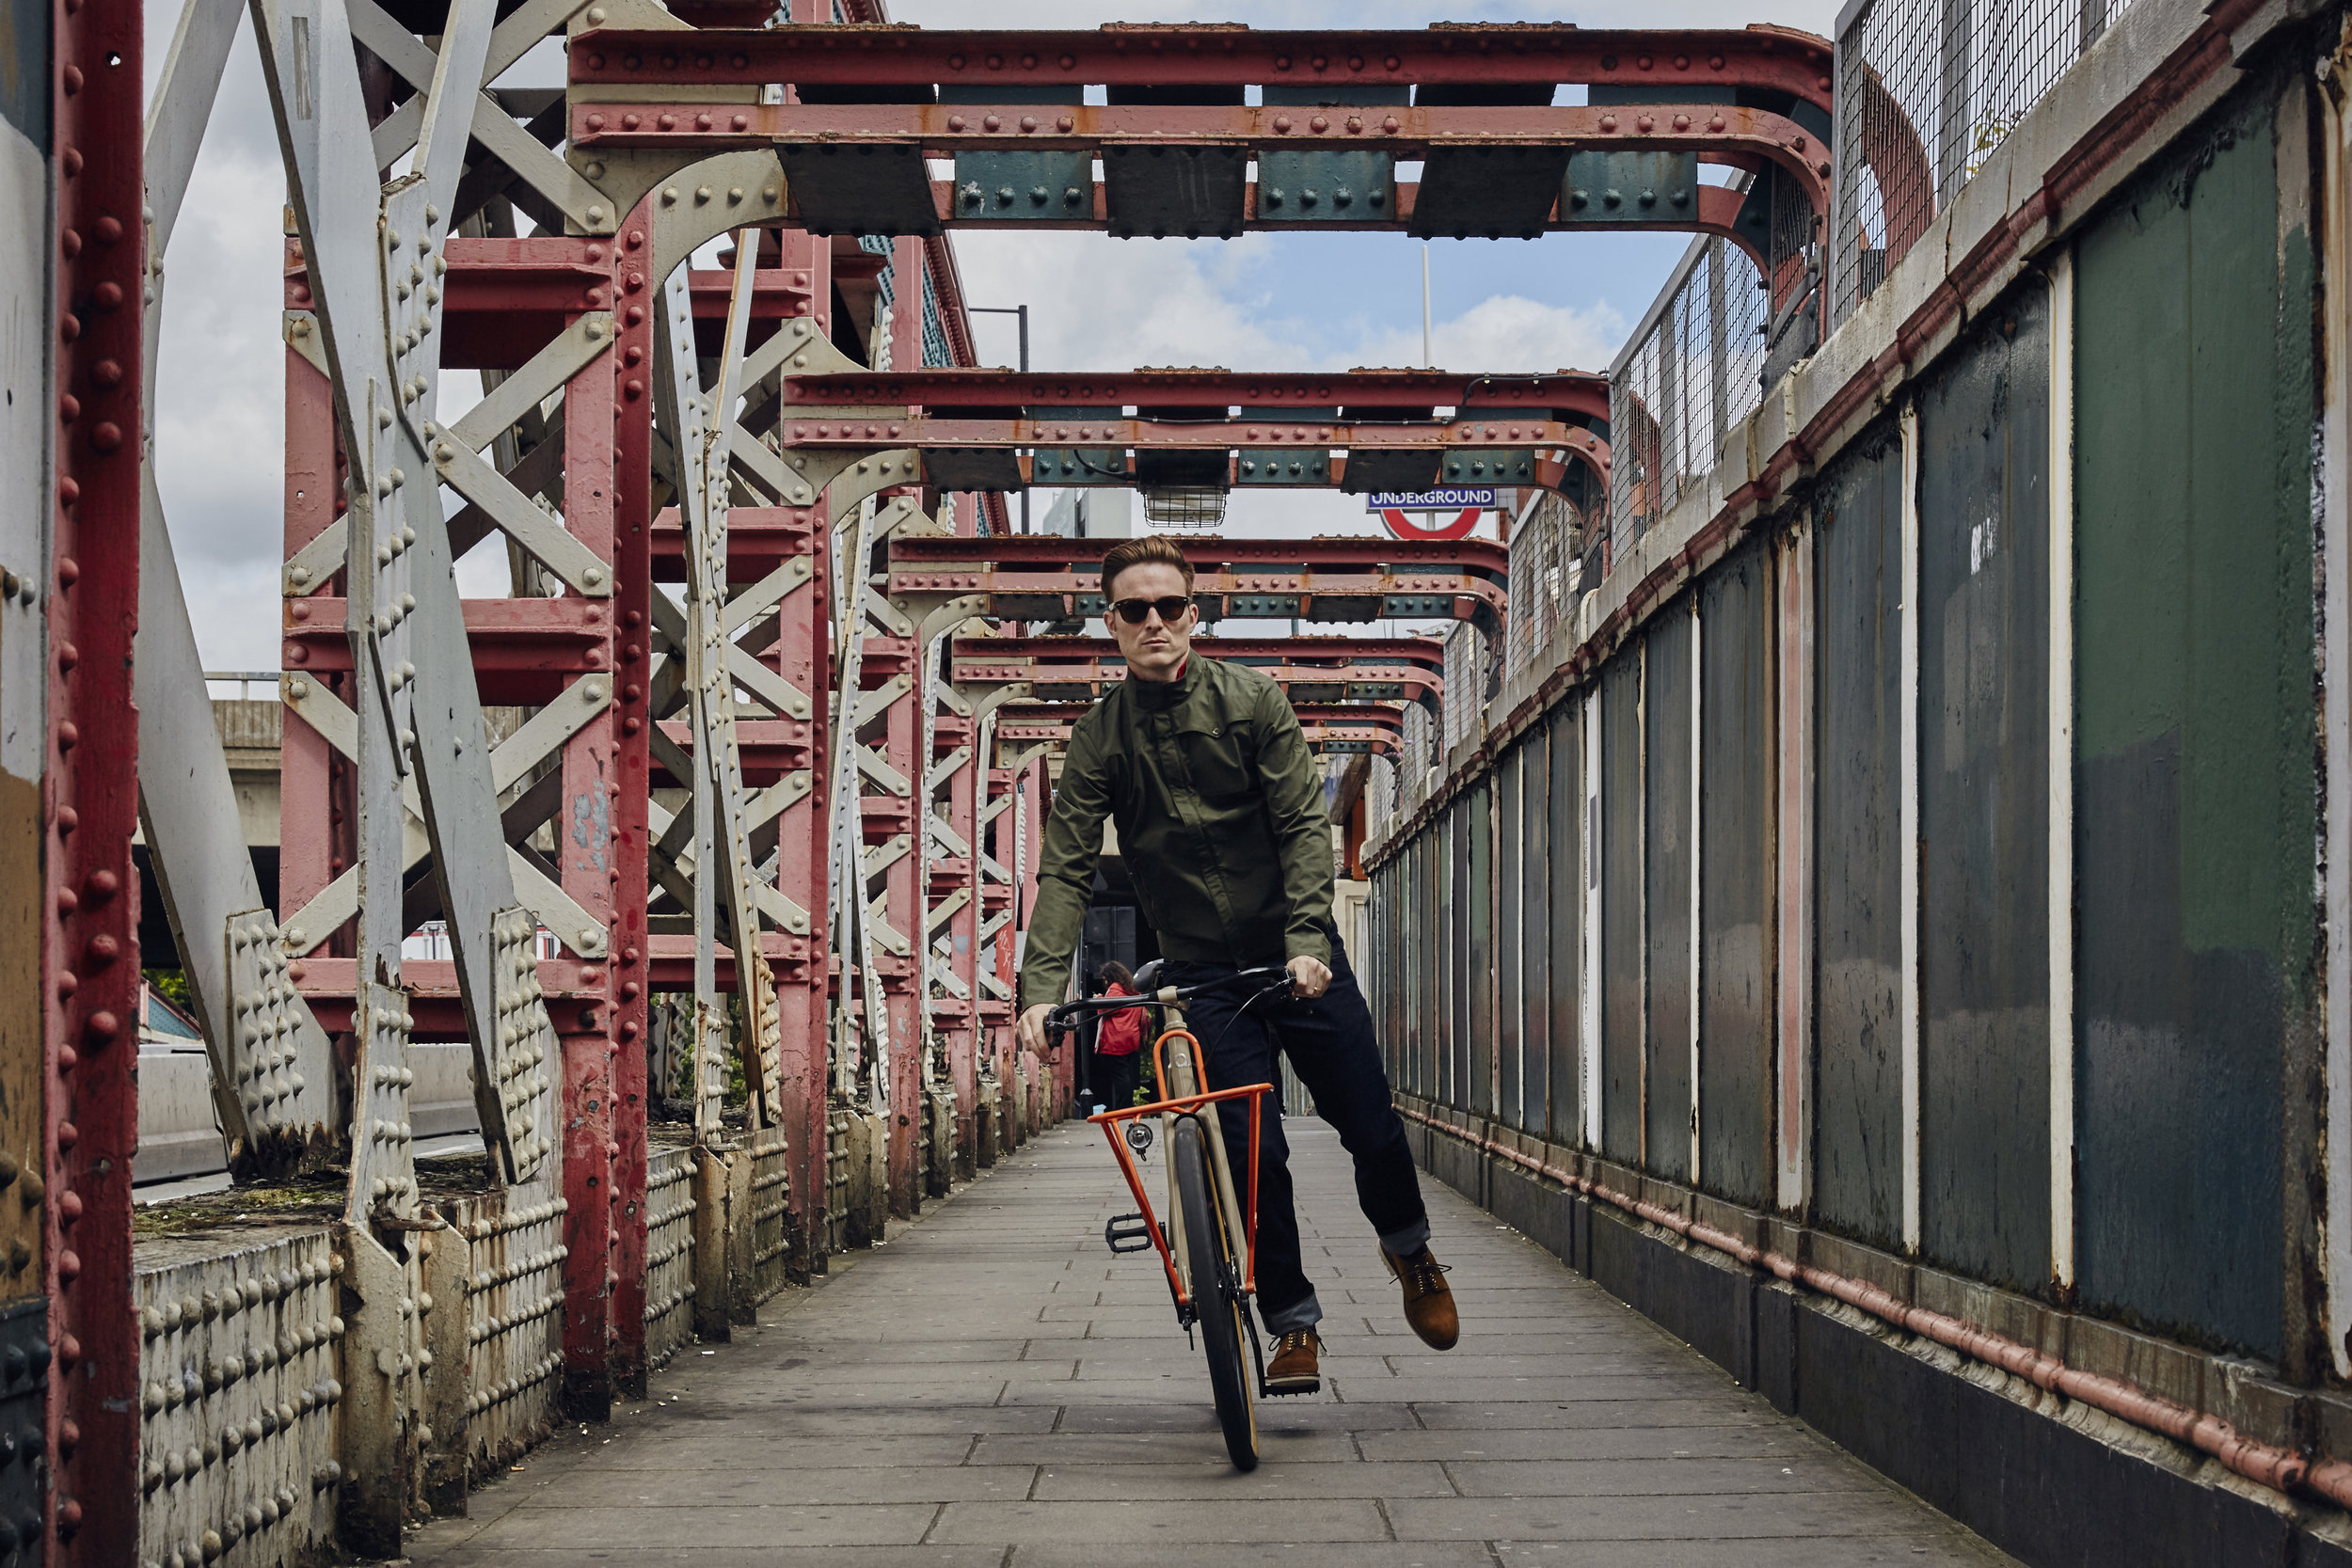 vulpine nick hussey cool cycling commuter city urban notting hill.jpg